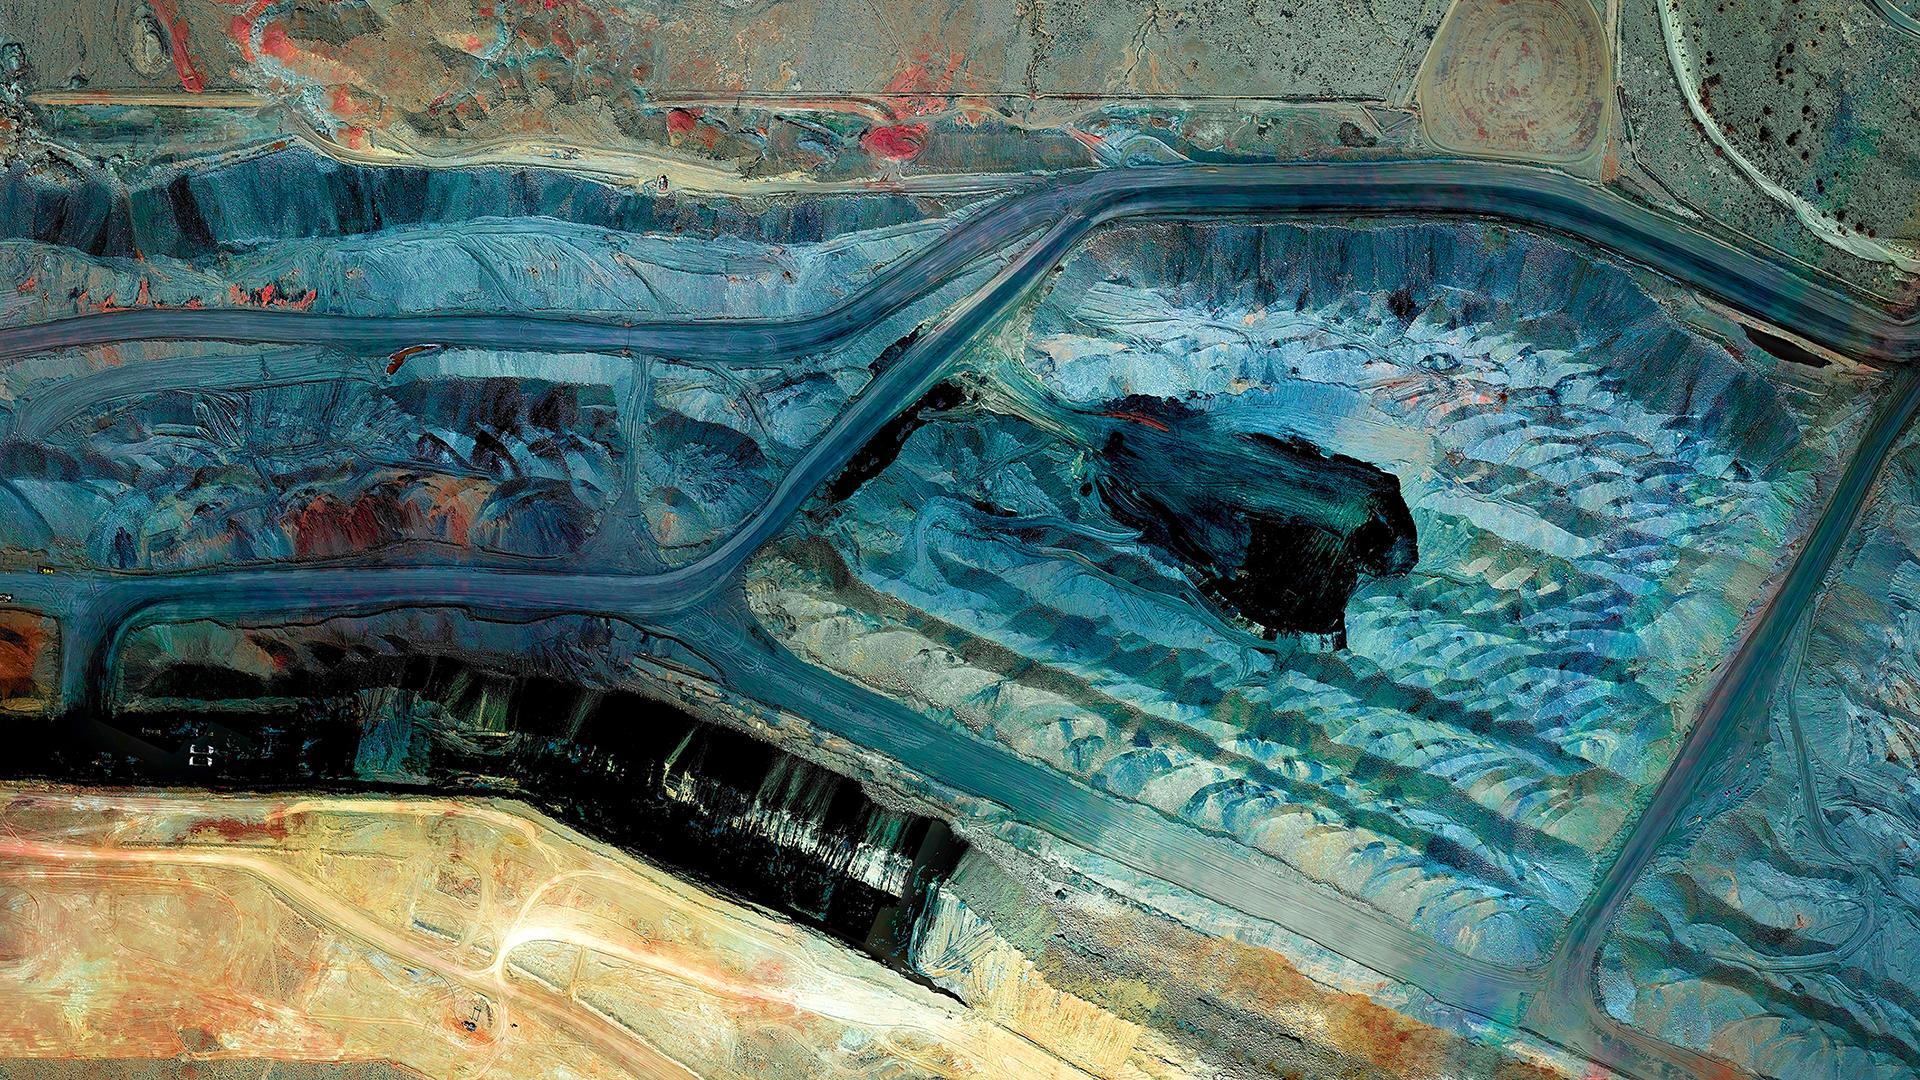 Navajo-Mine-II-by-Ultradistancia-Federico-Winer